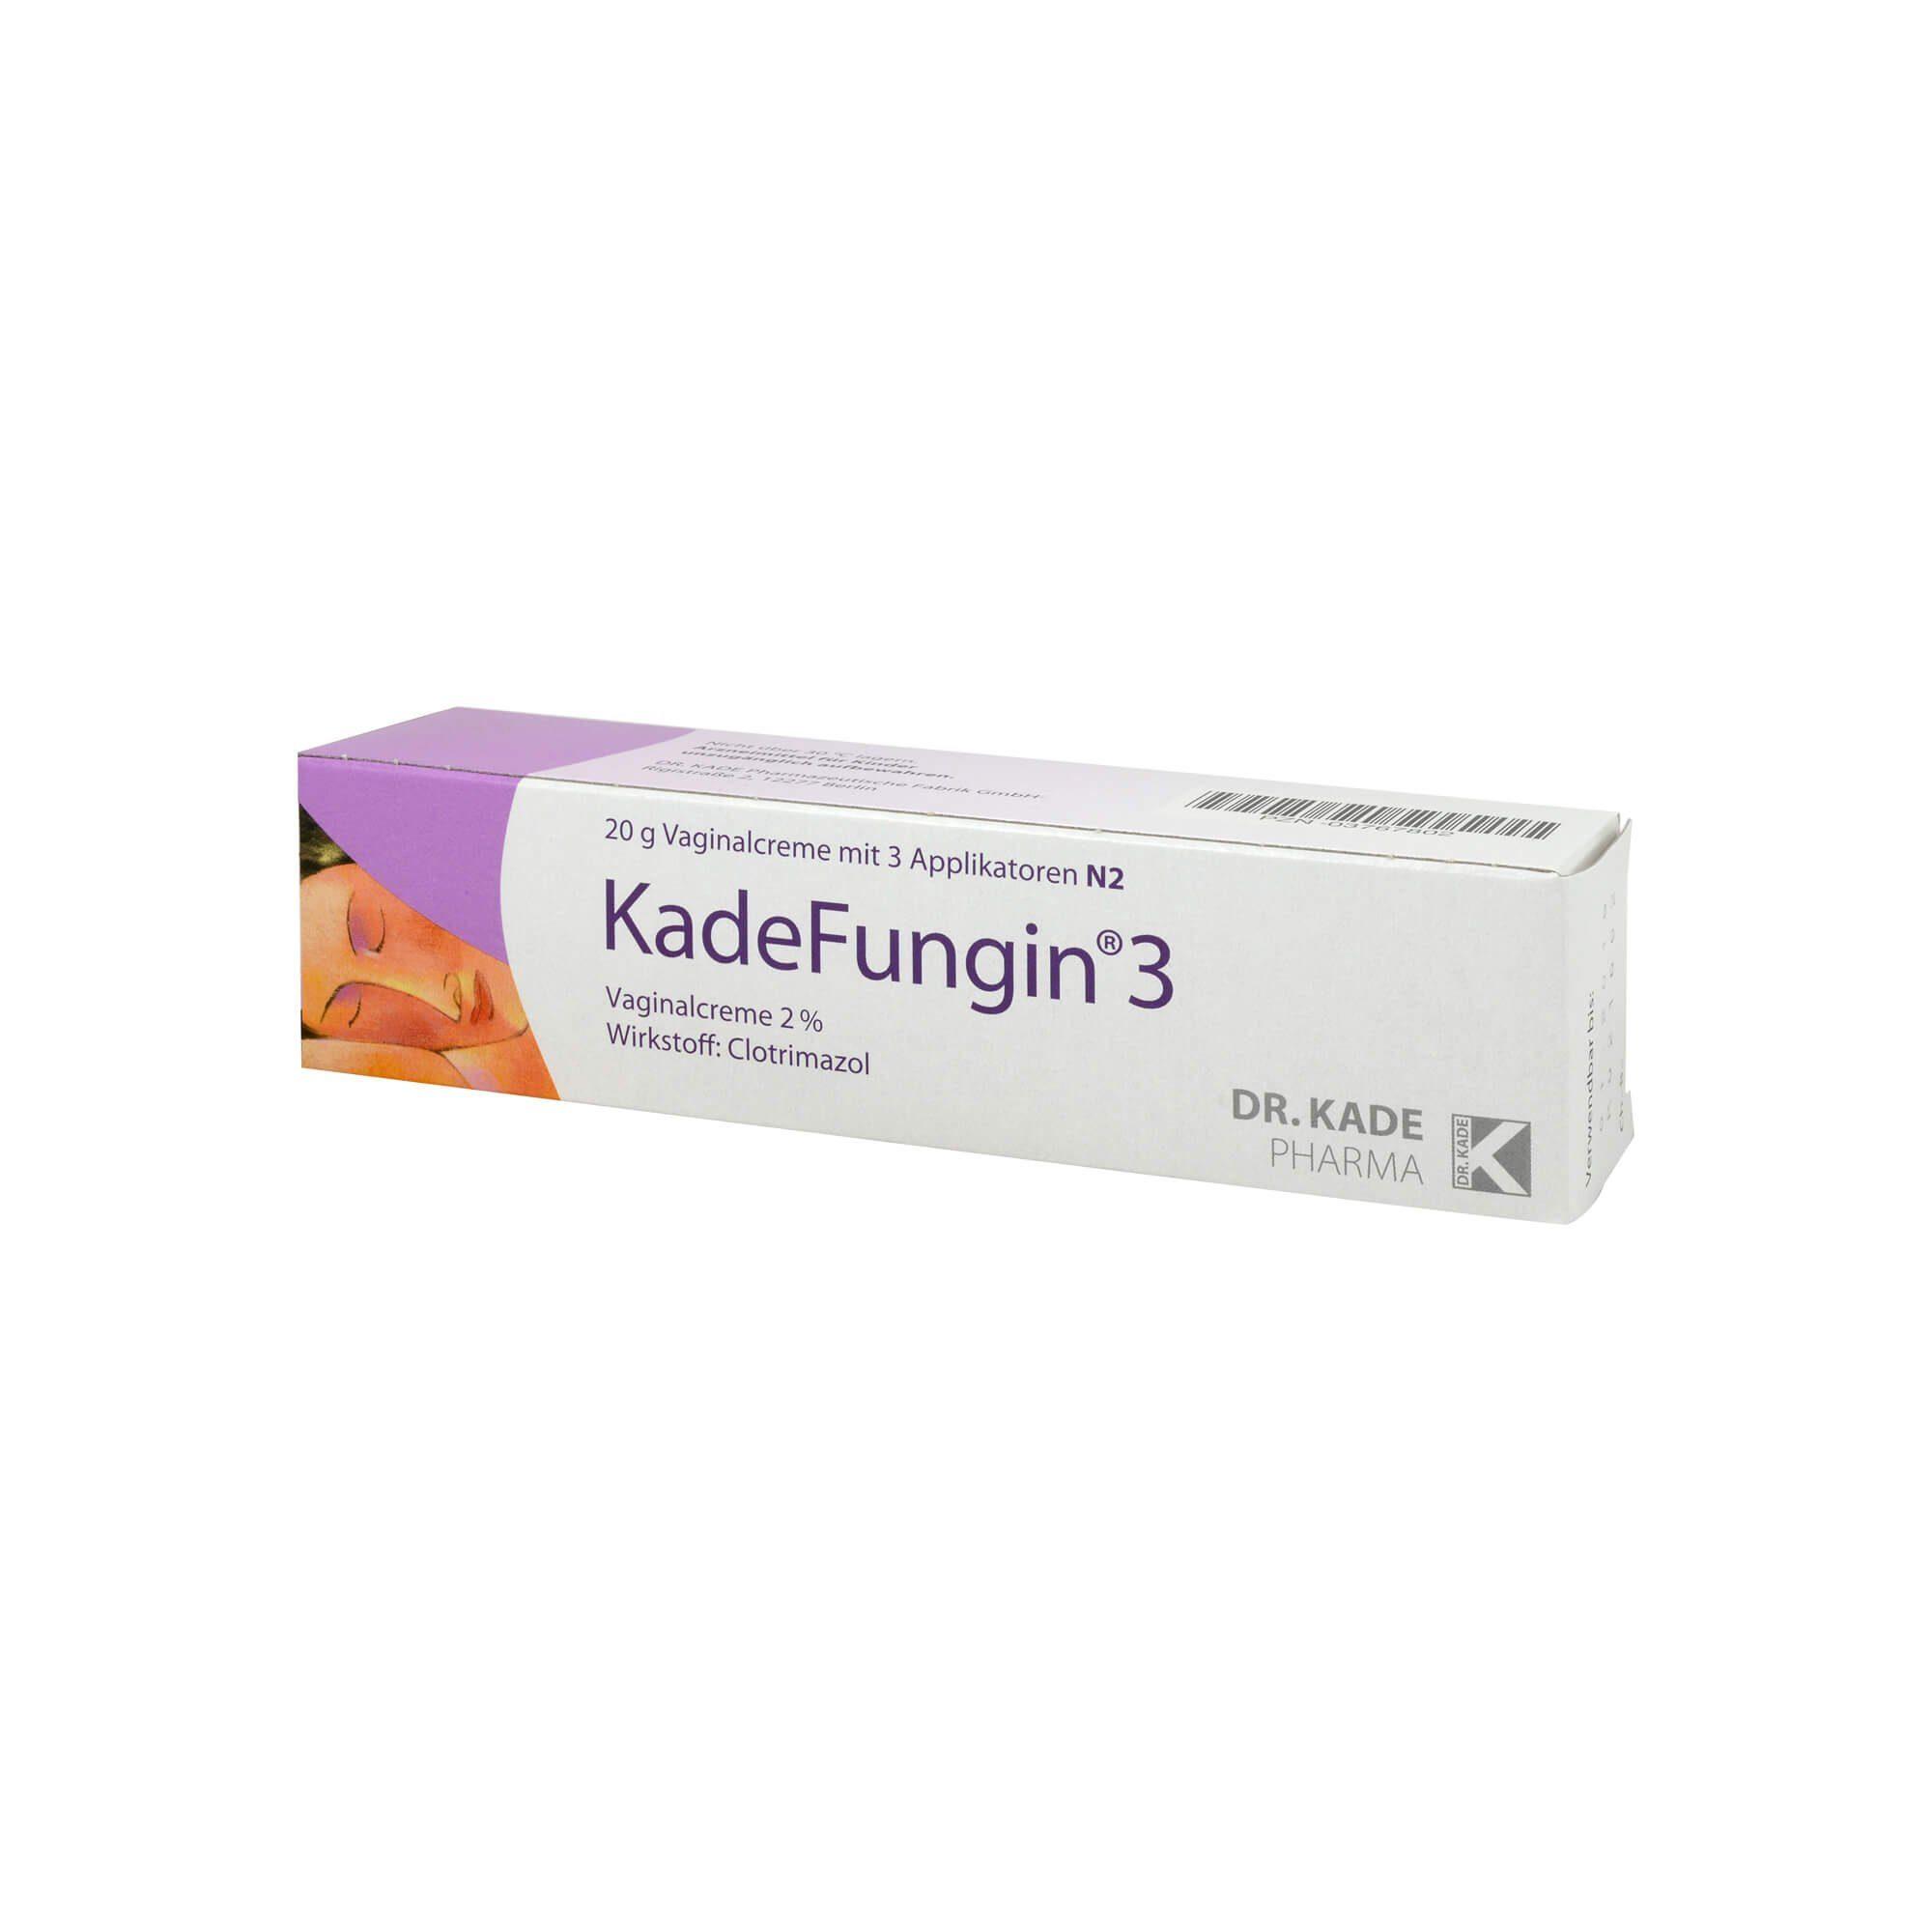 Kadefungin 3 Vaginalcreme, 20 g